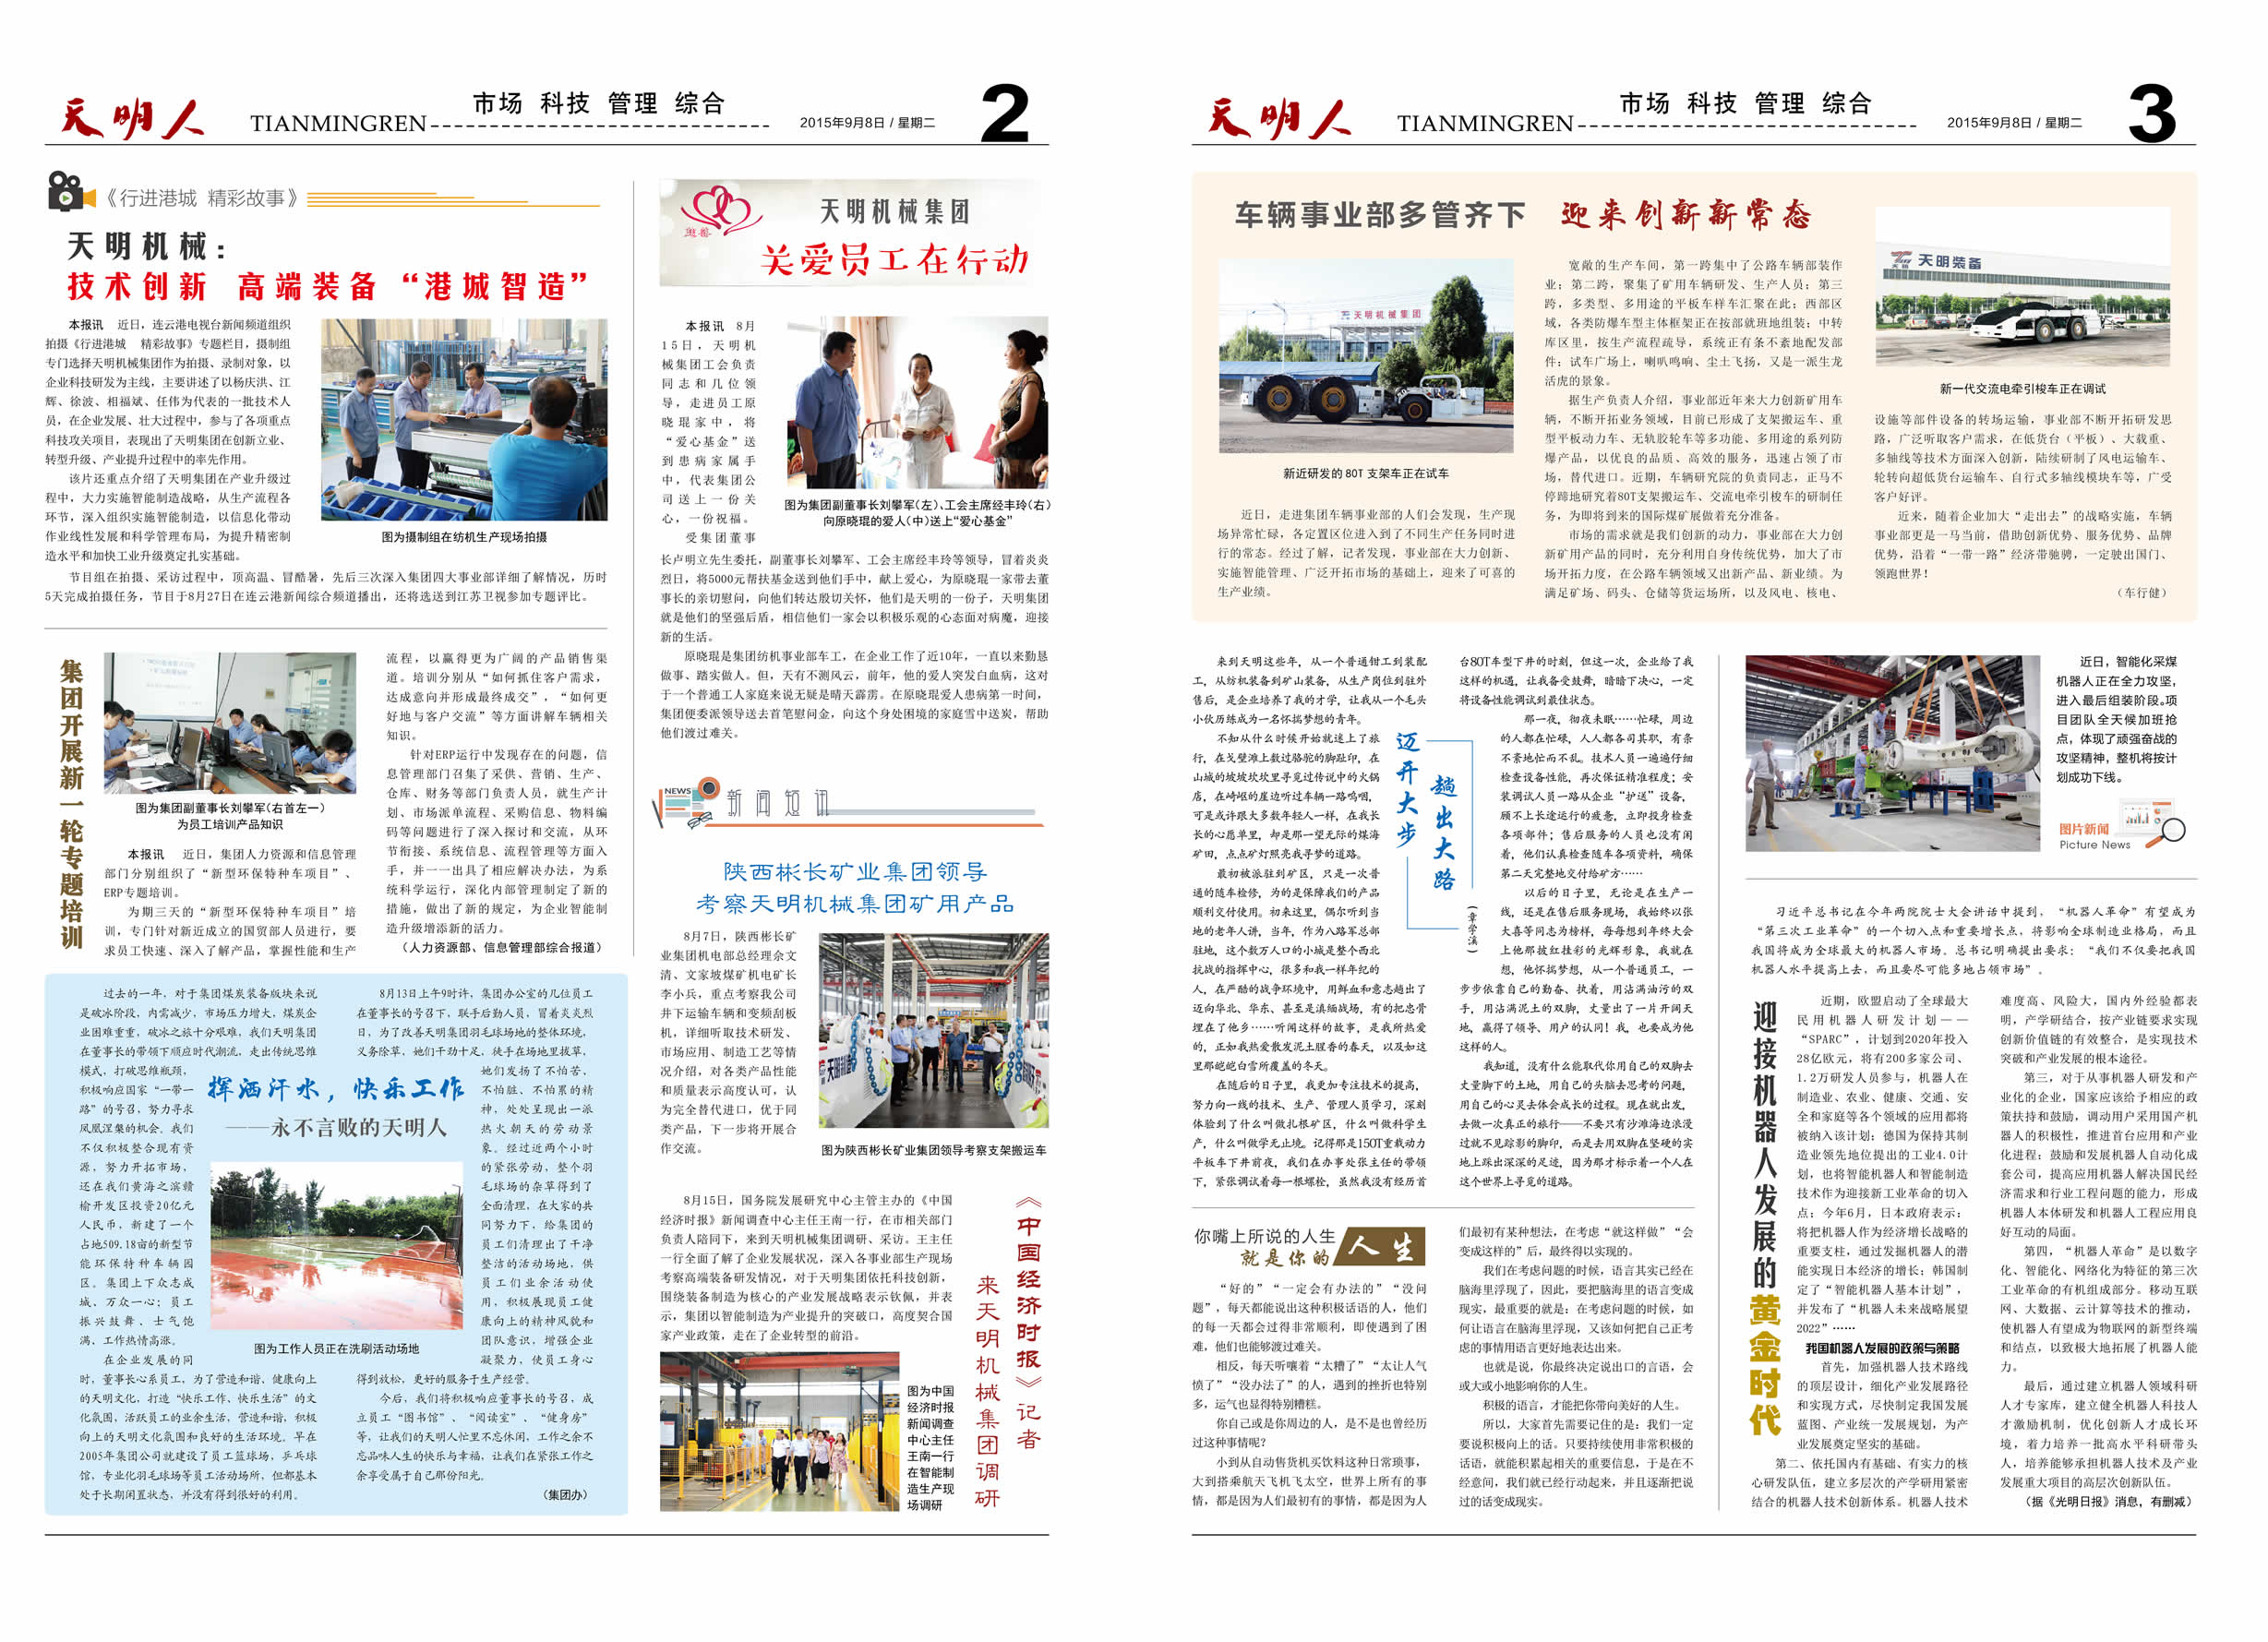 hg711皇冠国际_hg88皇冠国际平台_hg皇冠国际vip首页人2015第09期(总第94期)2、3版